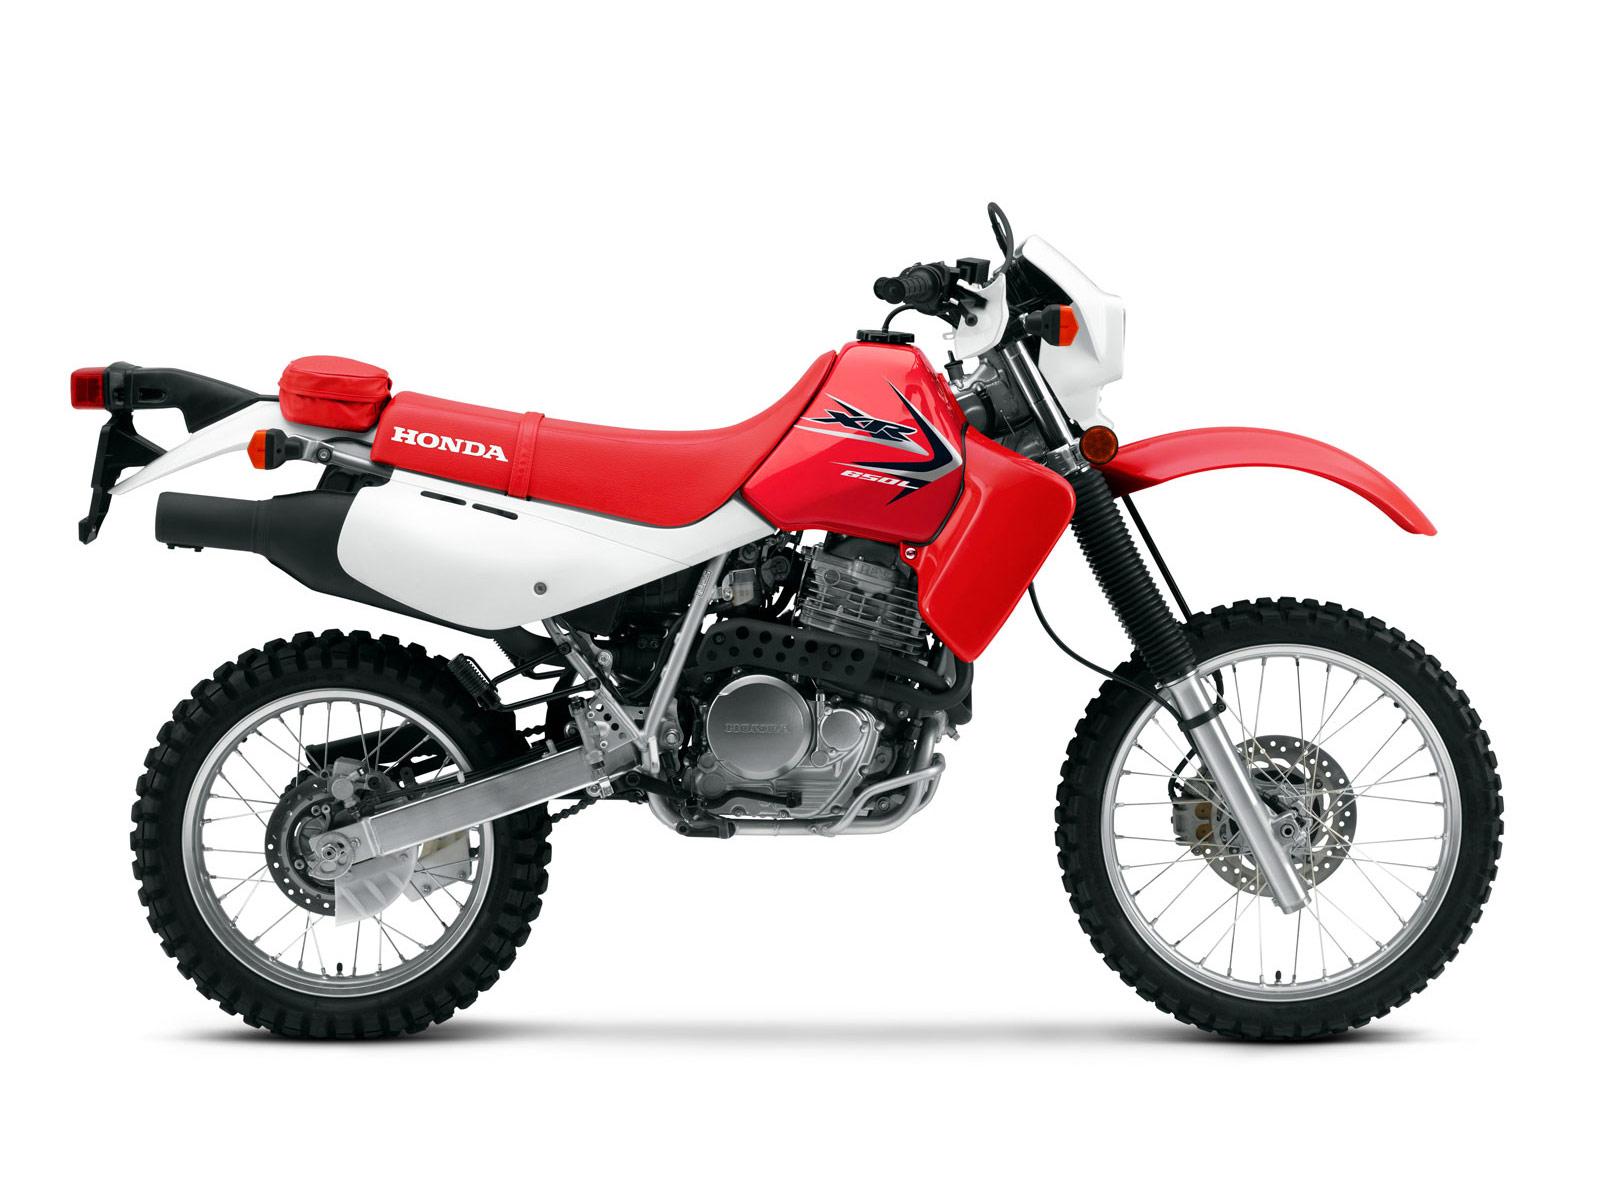 http://1.bp.blogspot.com/-FurHOsERGes/Tk4BYvvJHEI/AAAAAAAAAis/XnXE-wKuYpM/s1600/2012-Honda-XR650L-motorcycle-desktop-wallpaper.jpg